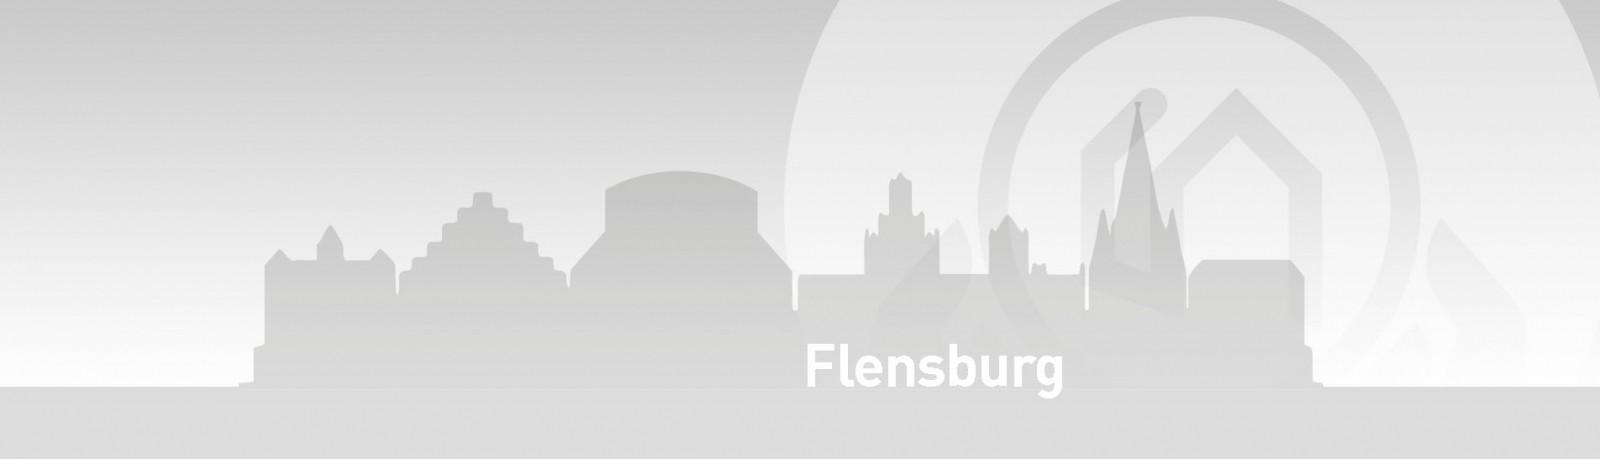 Flensburg SENCURINA 1904x546 - Flensburg